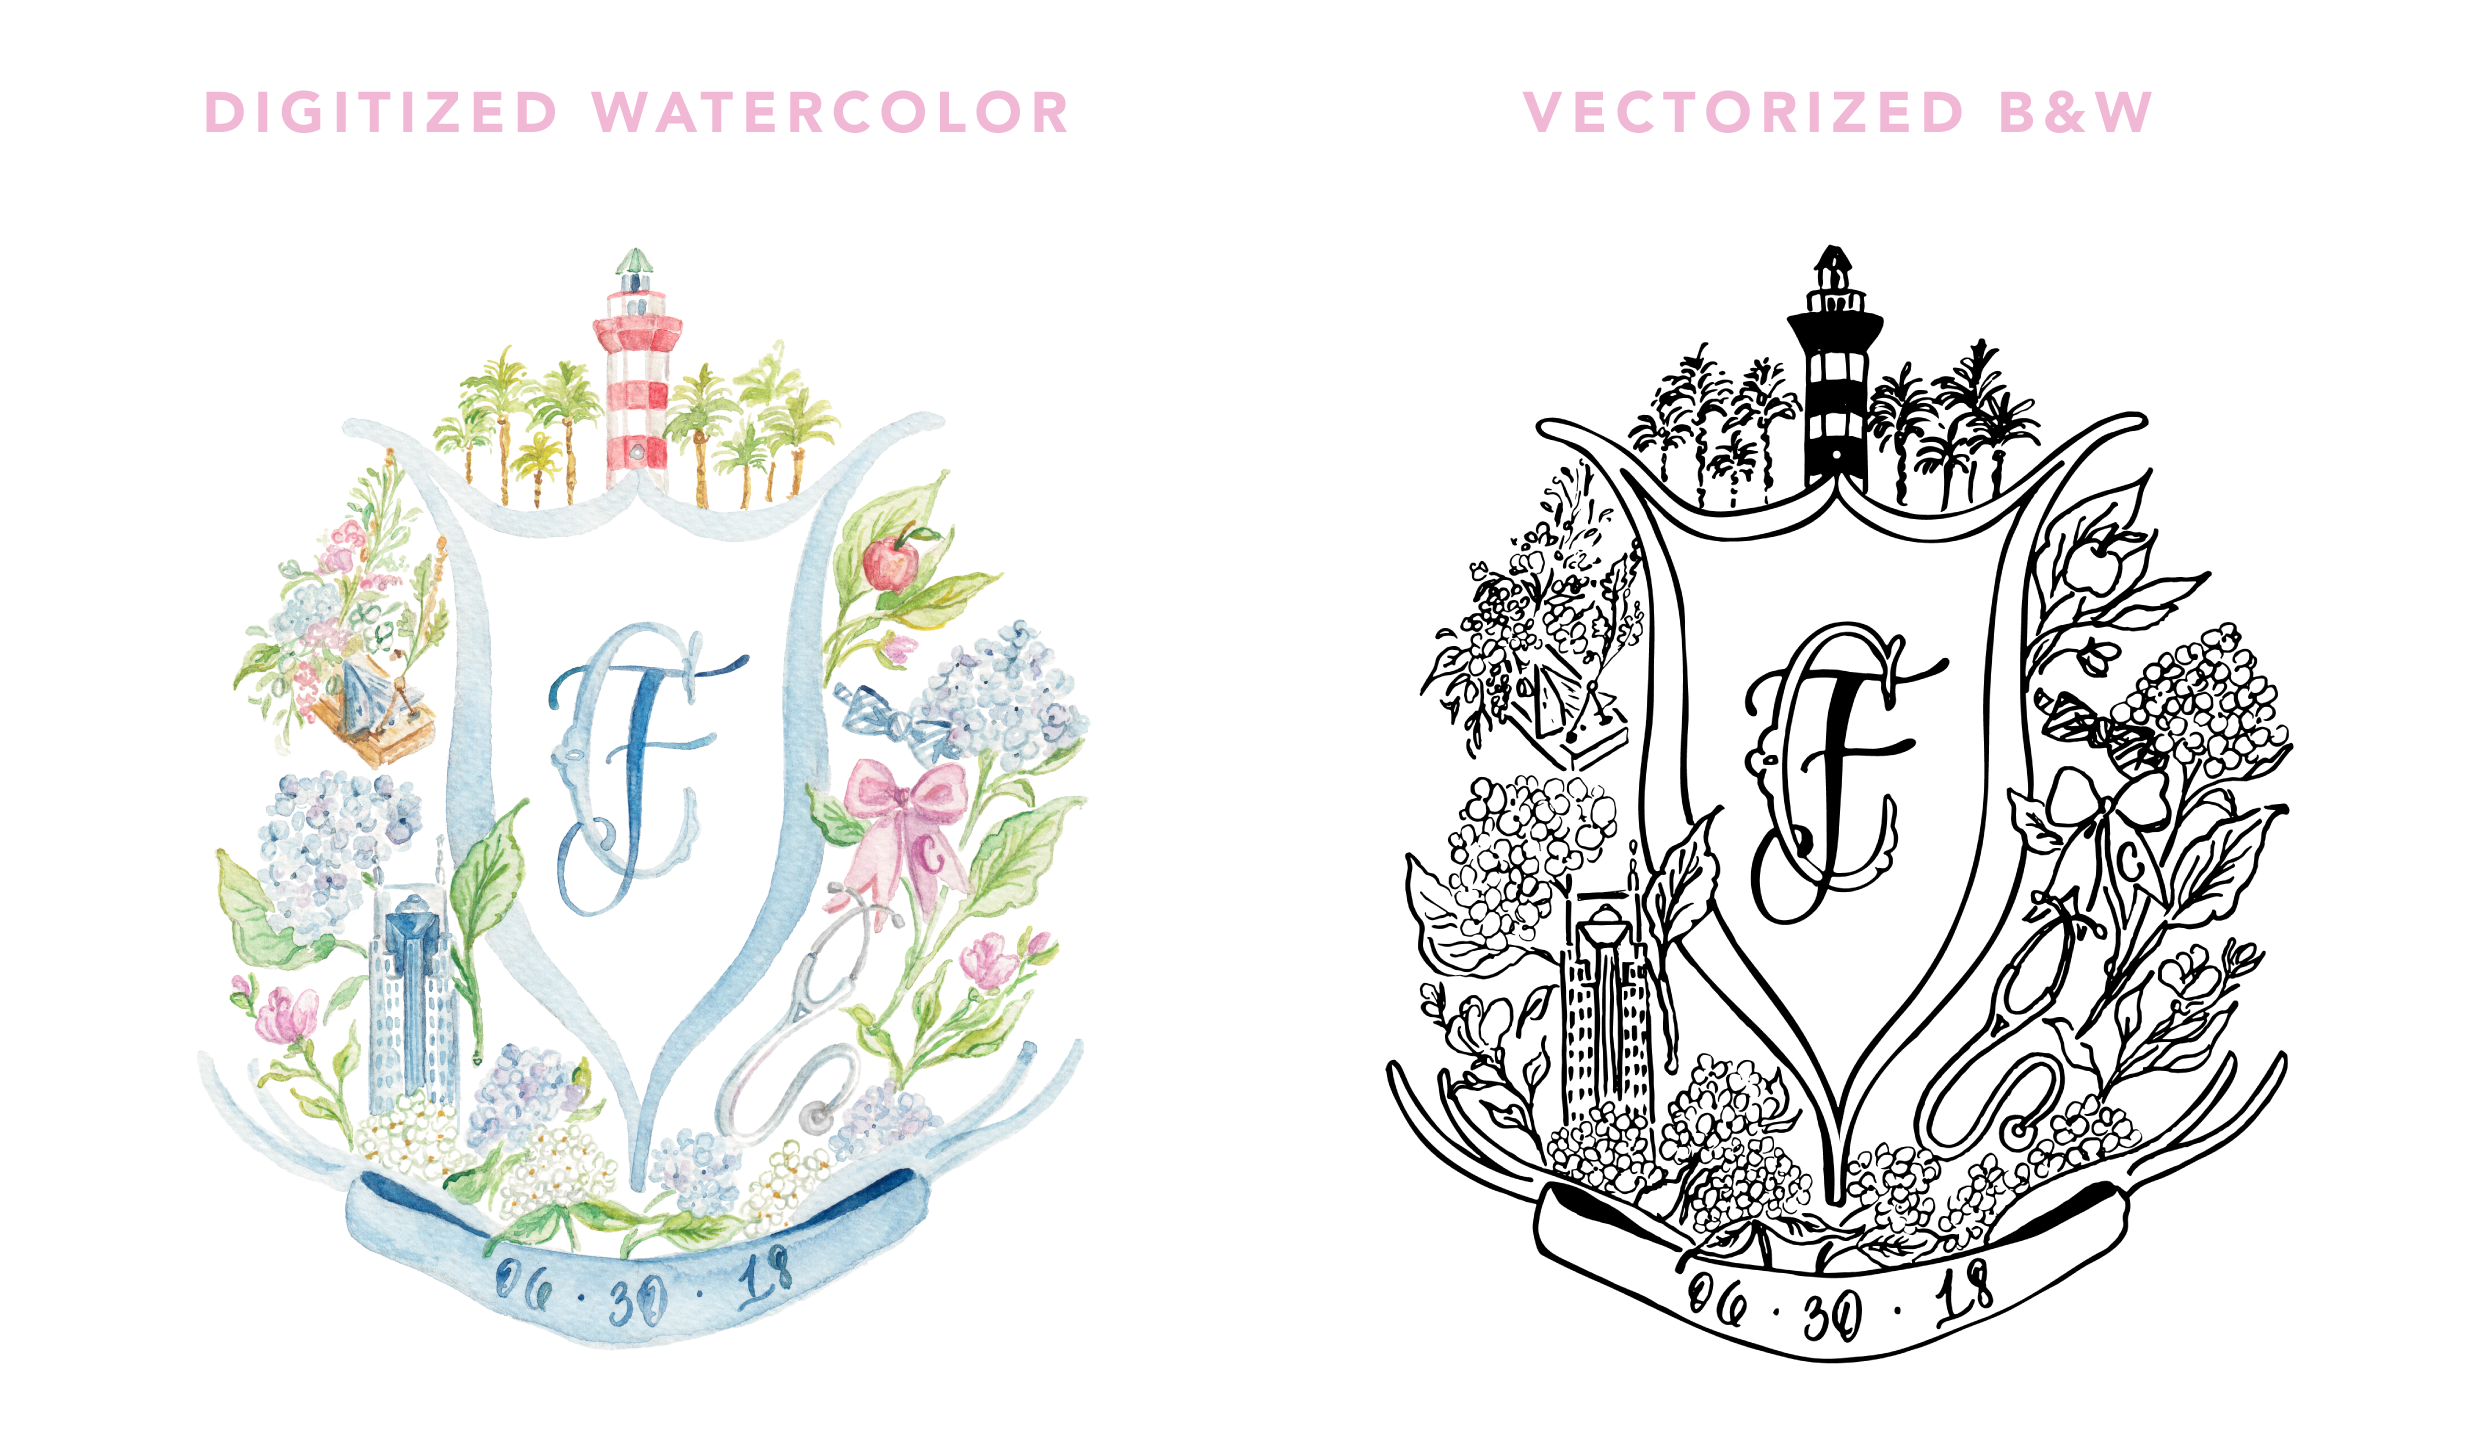 Digitizing-Watercolors-Versus-Vectorizing-Artwork-by-Simply-Jessica-Marie.png